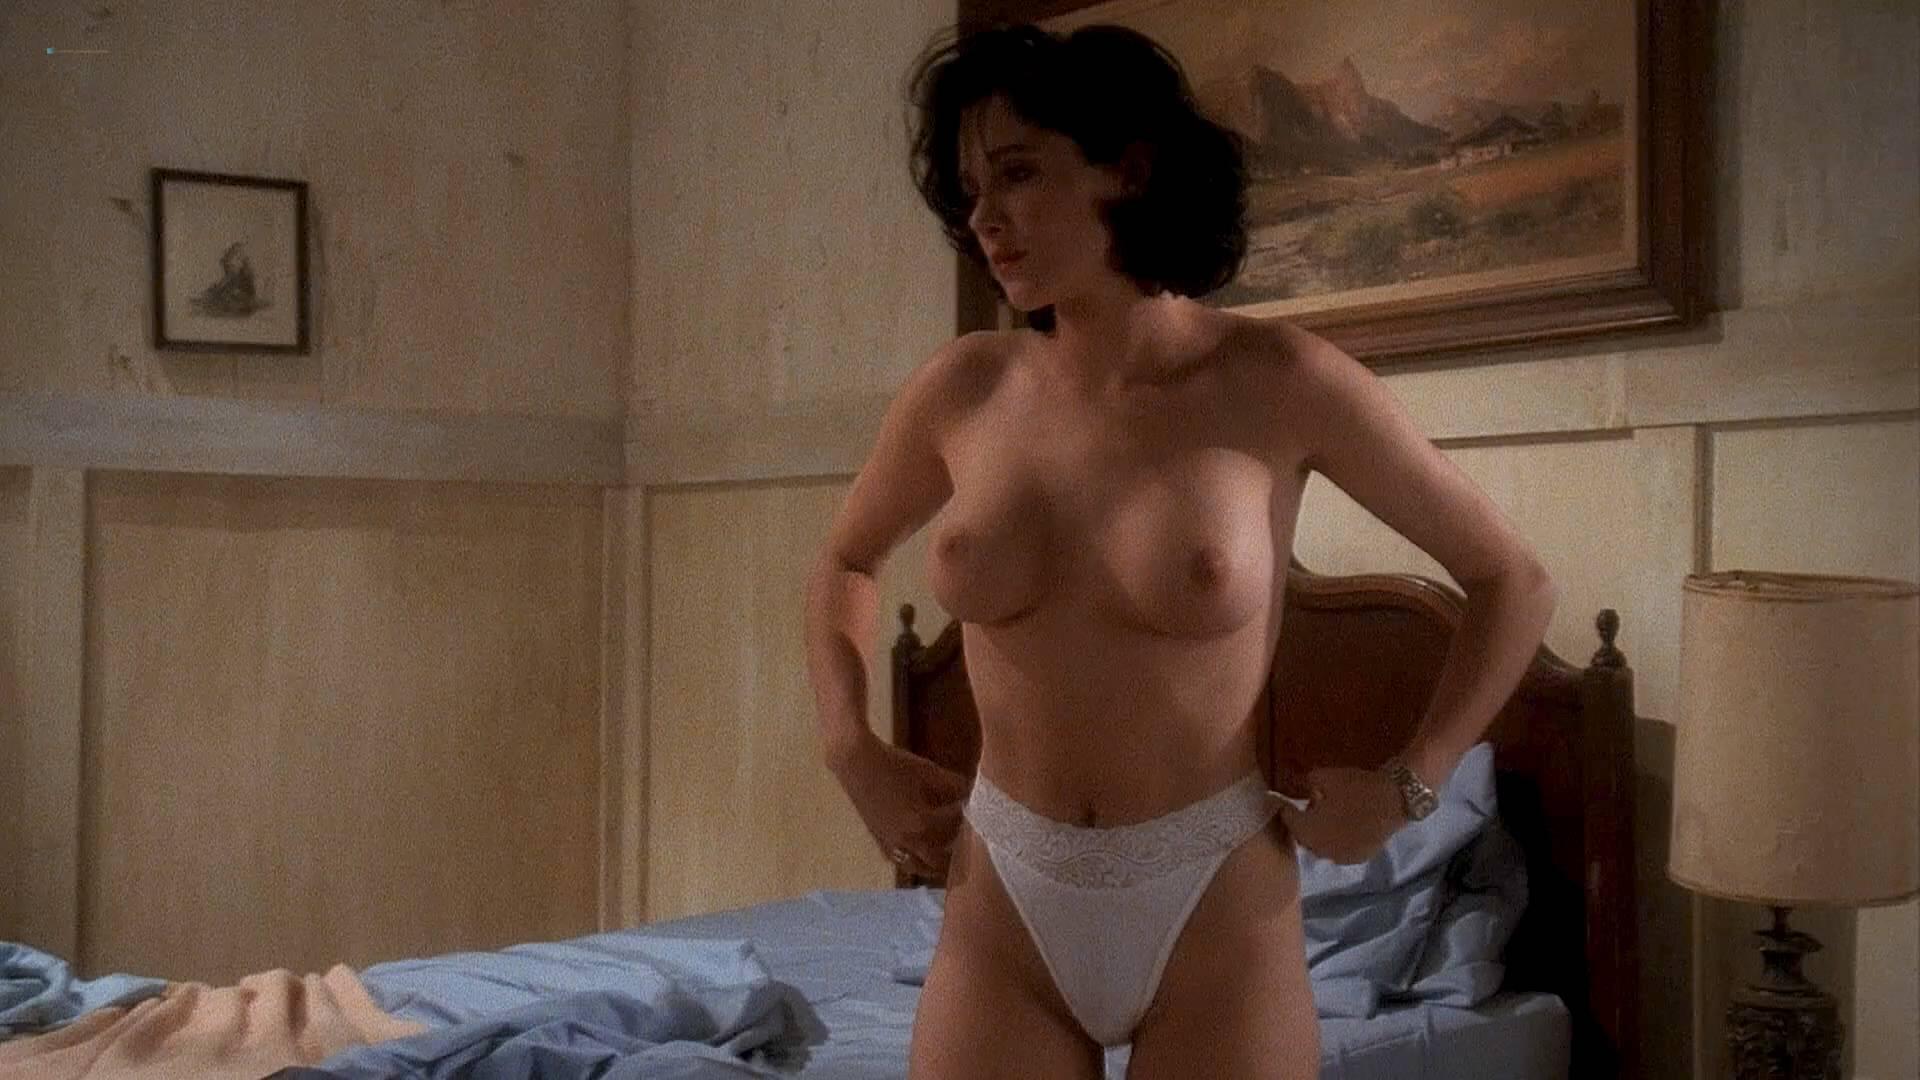 zoe mclellan ever nude